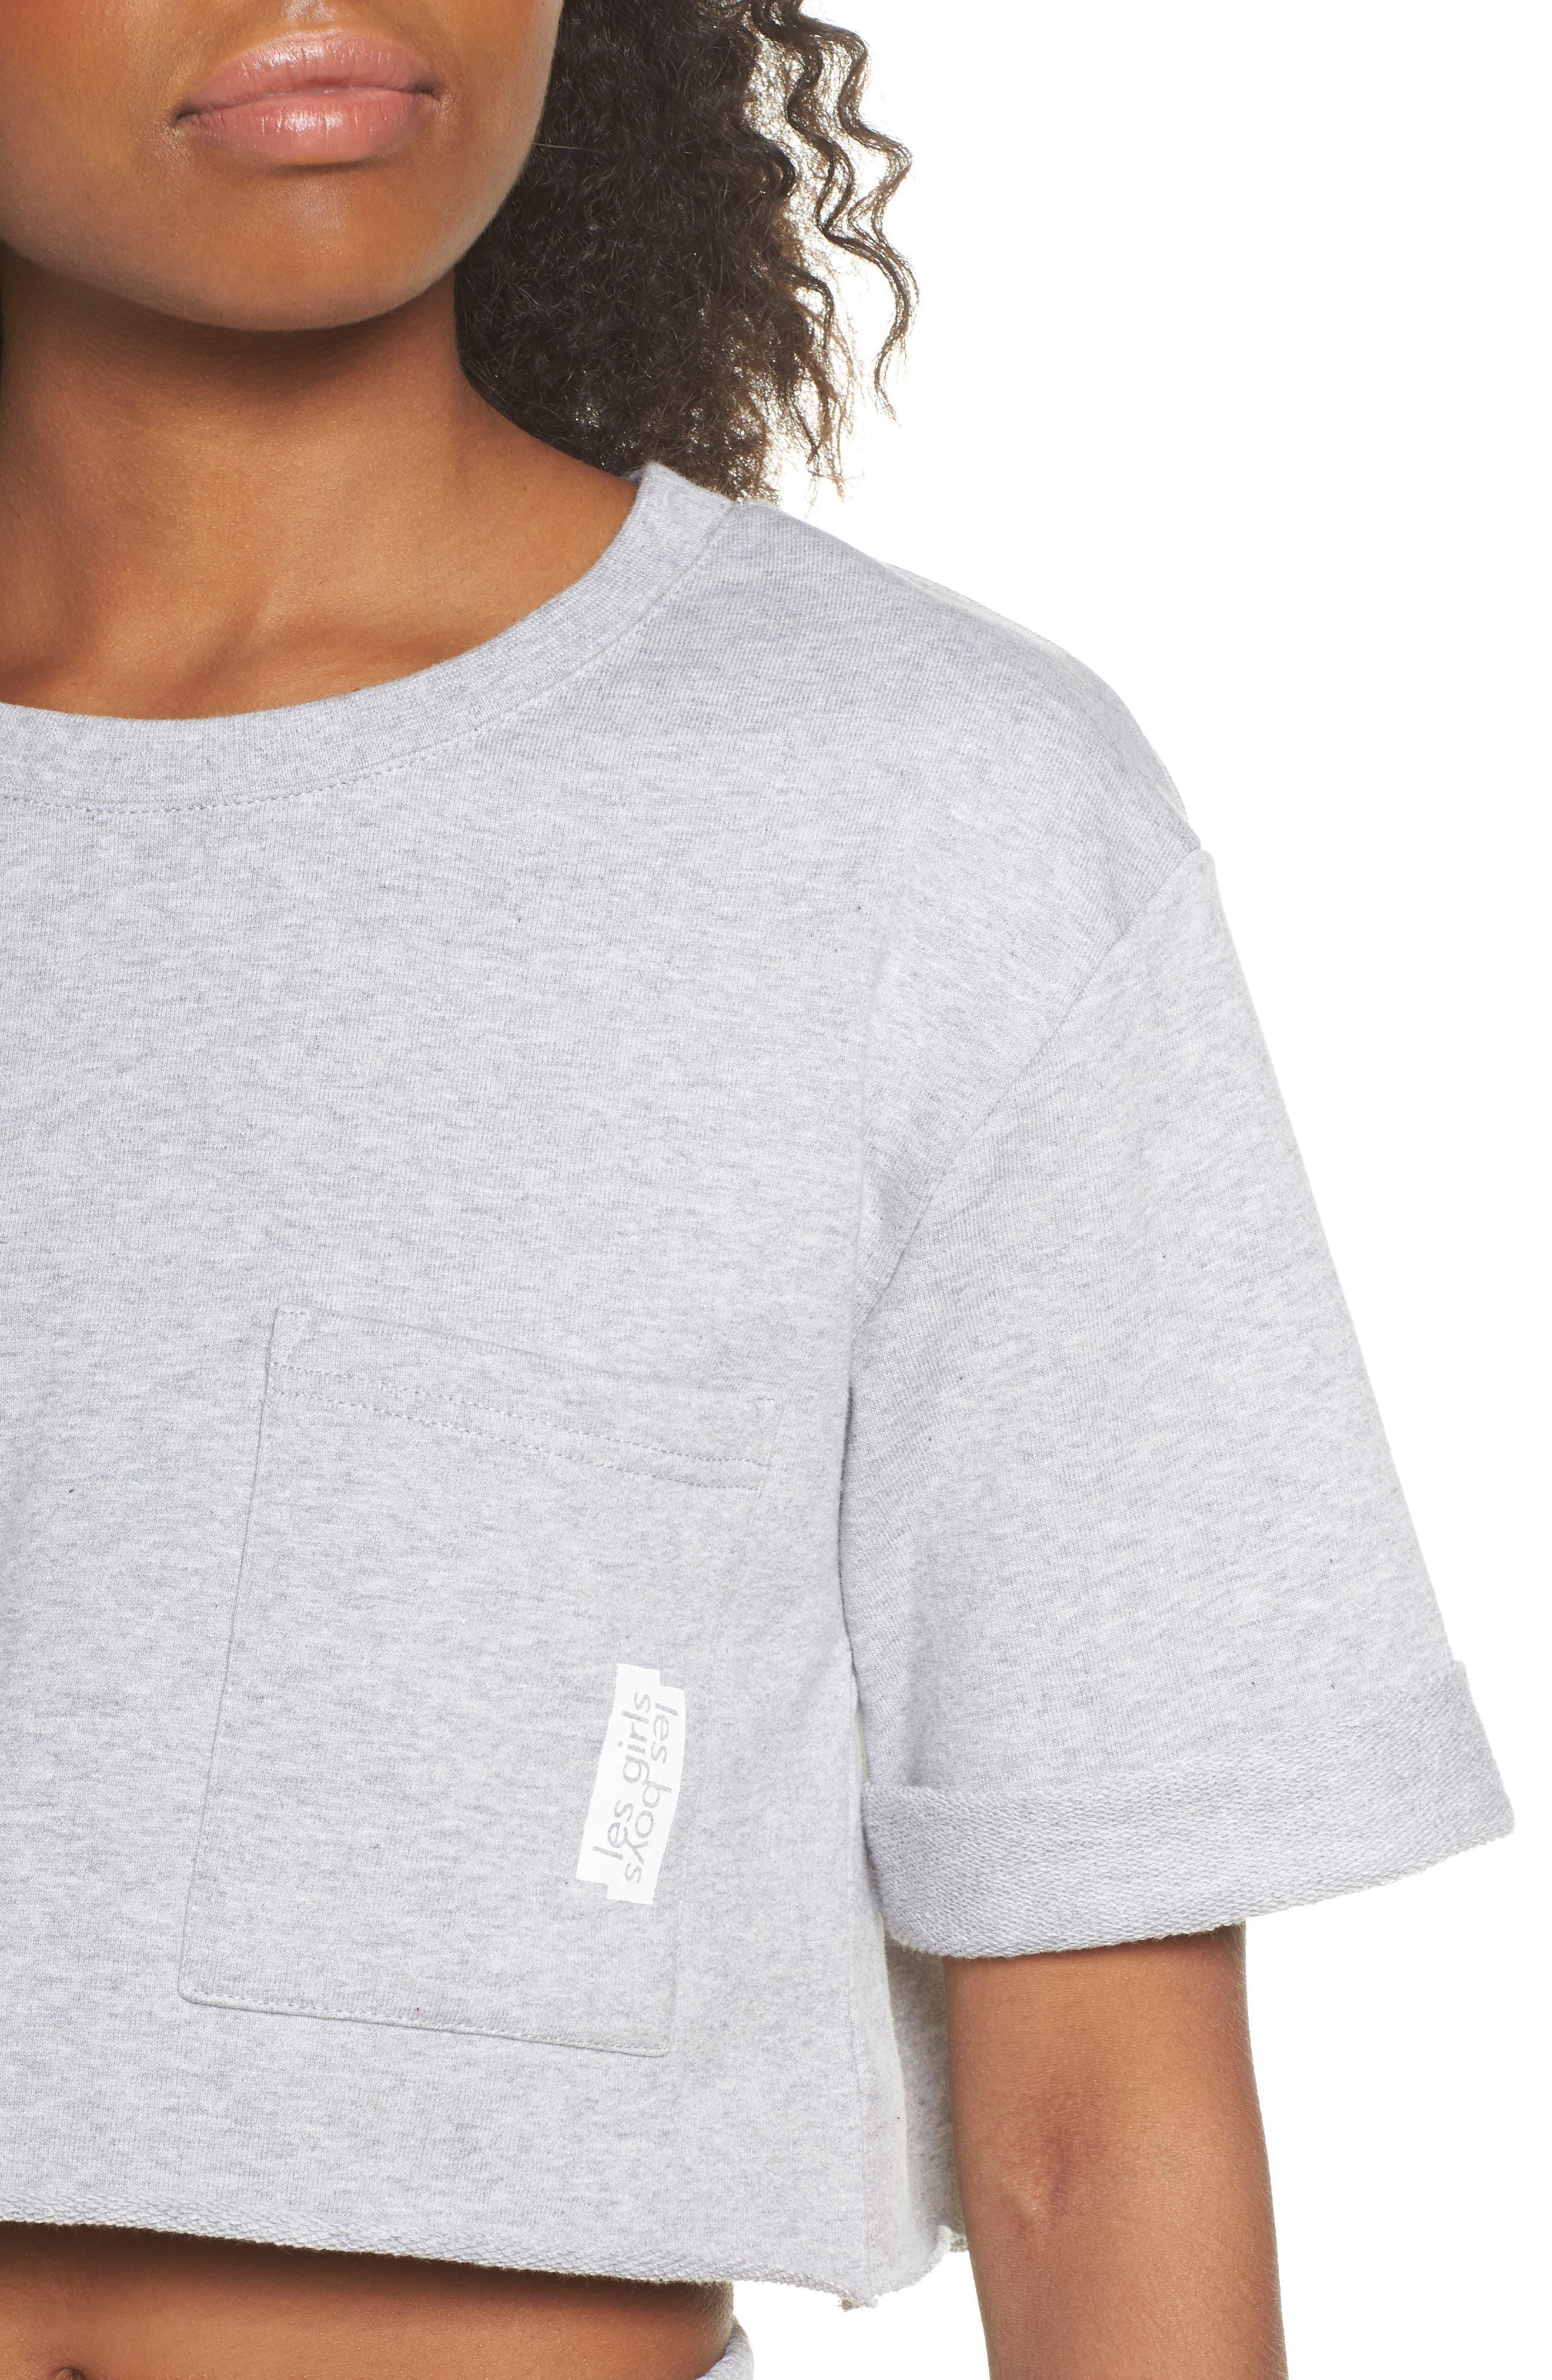 French Terry Crop Sweatshirt,                             Alternate thumbnail 6, color,                             Light Grey Marl